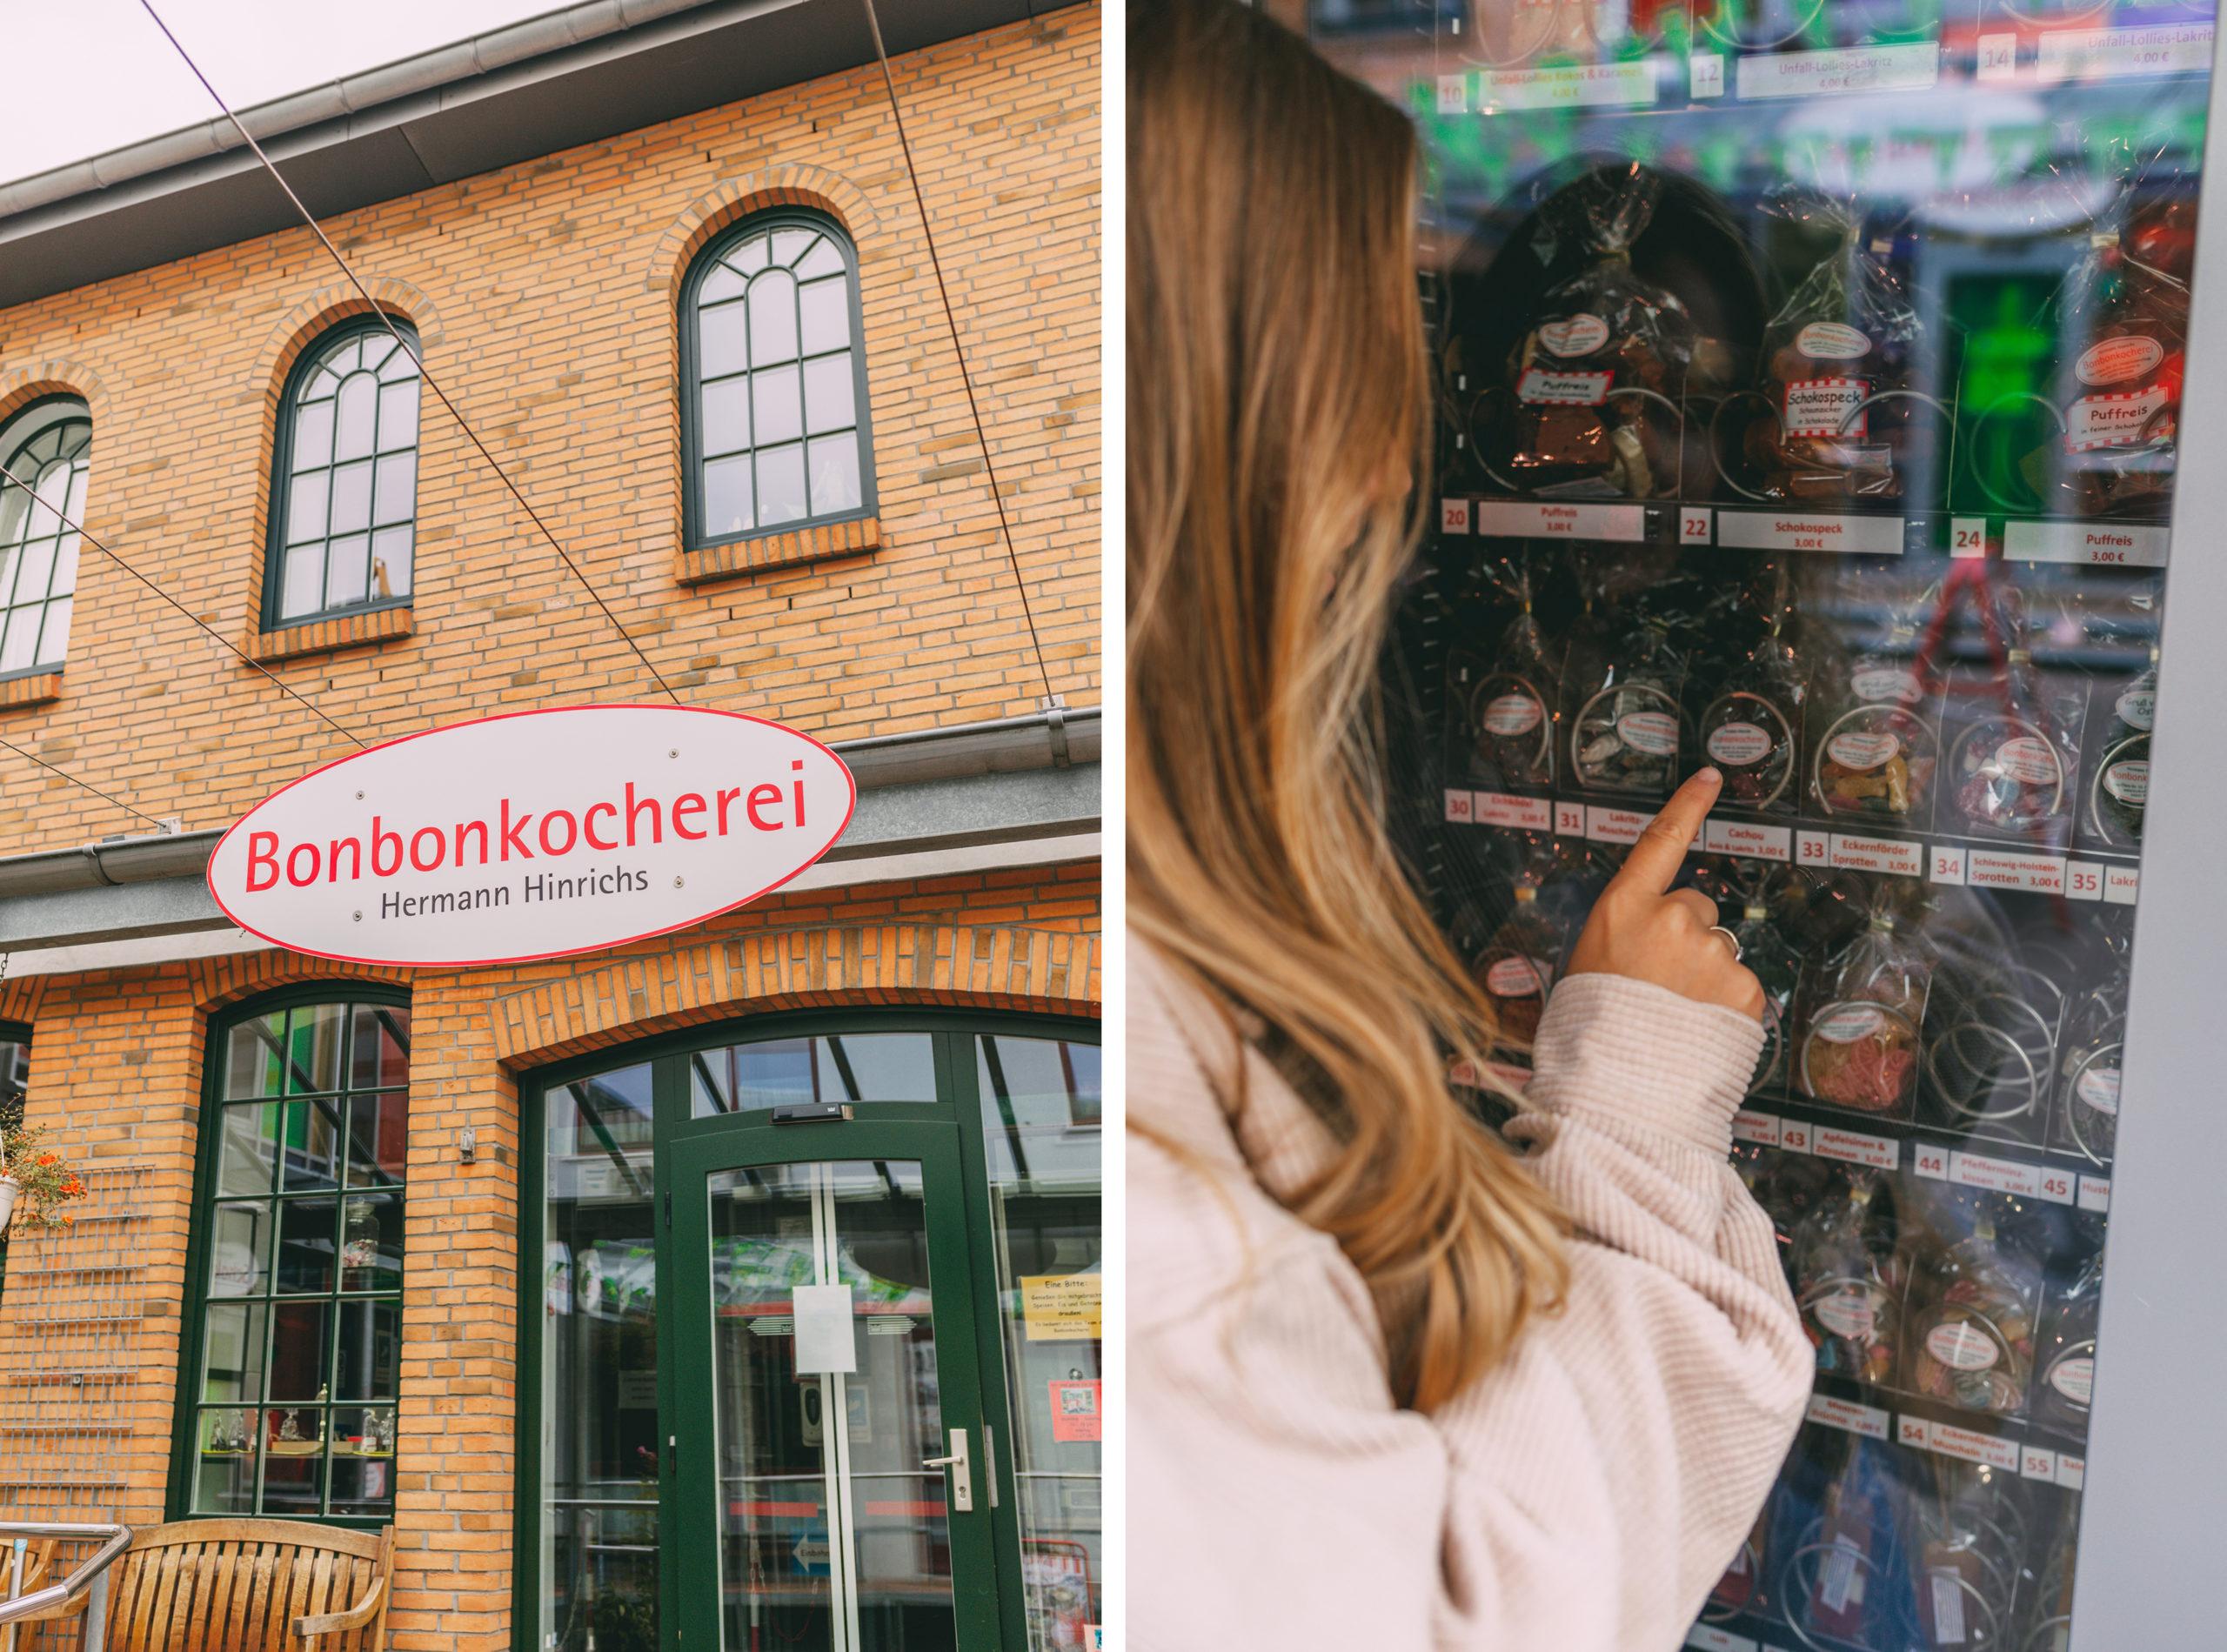 Bonbonkocherei Eckernförde